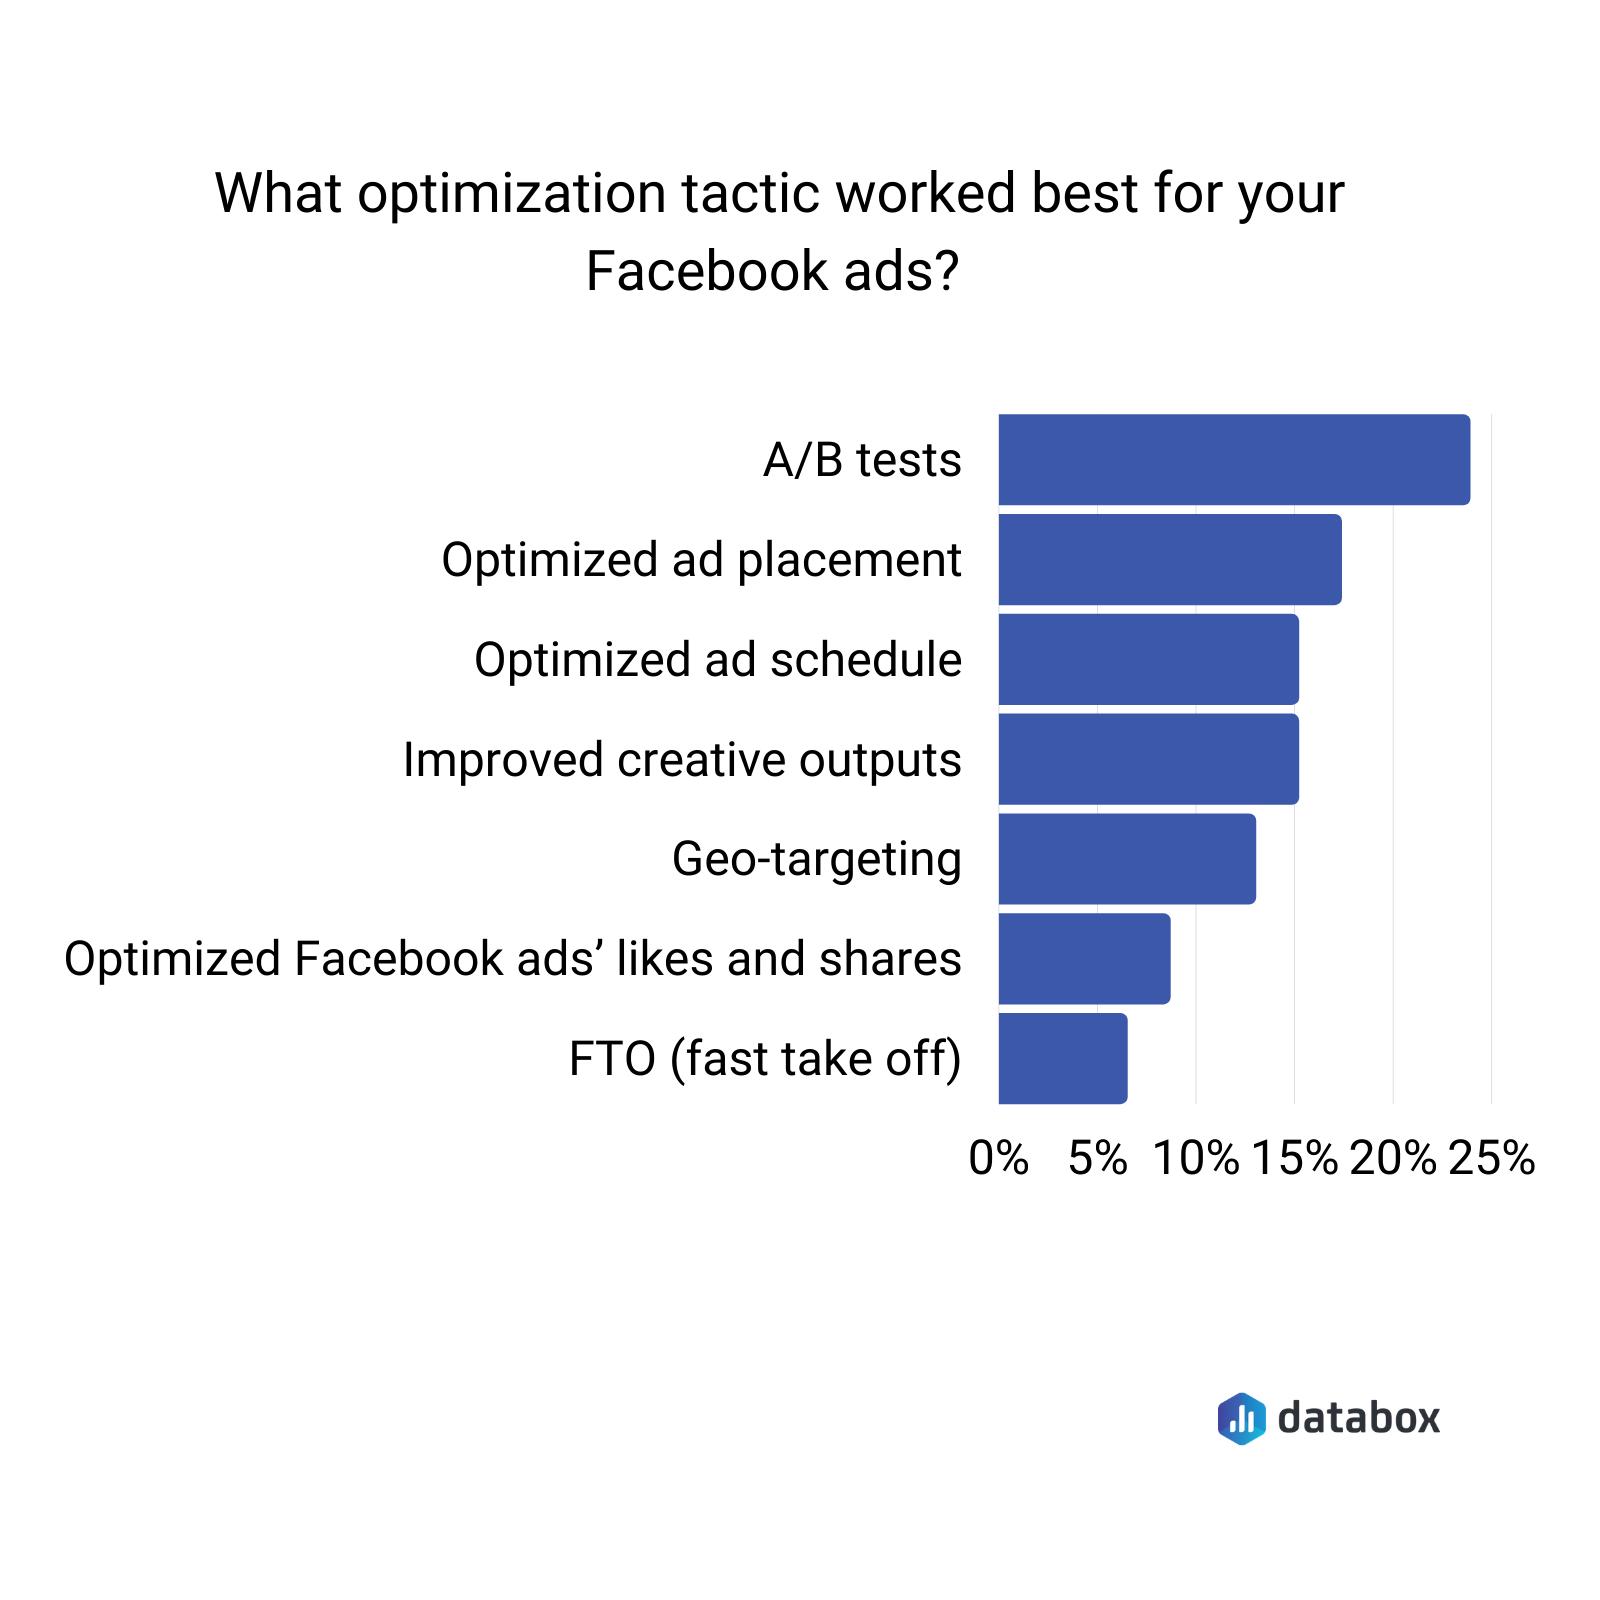 Facebook ads optimization tactics